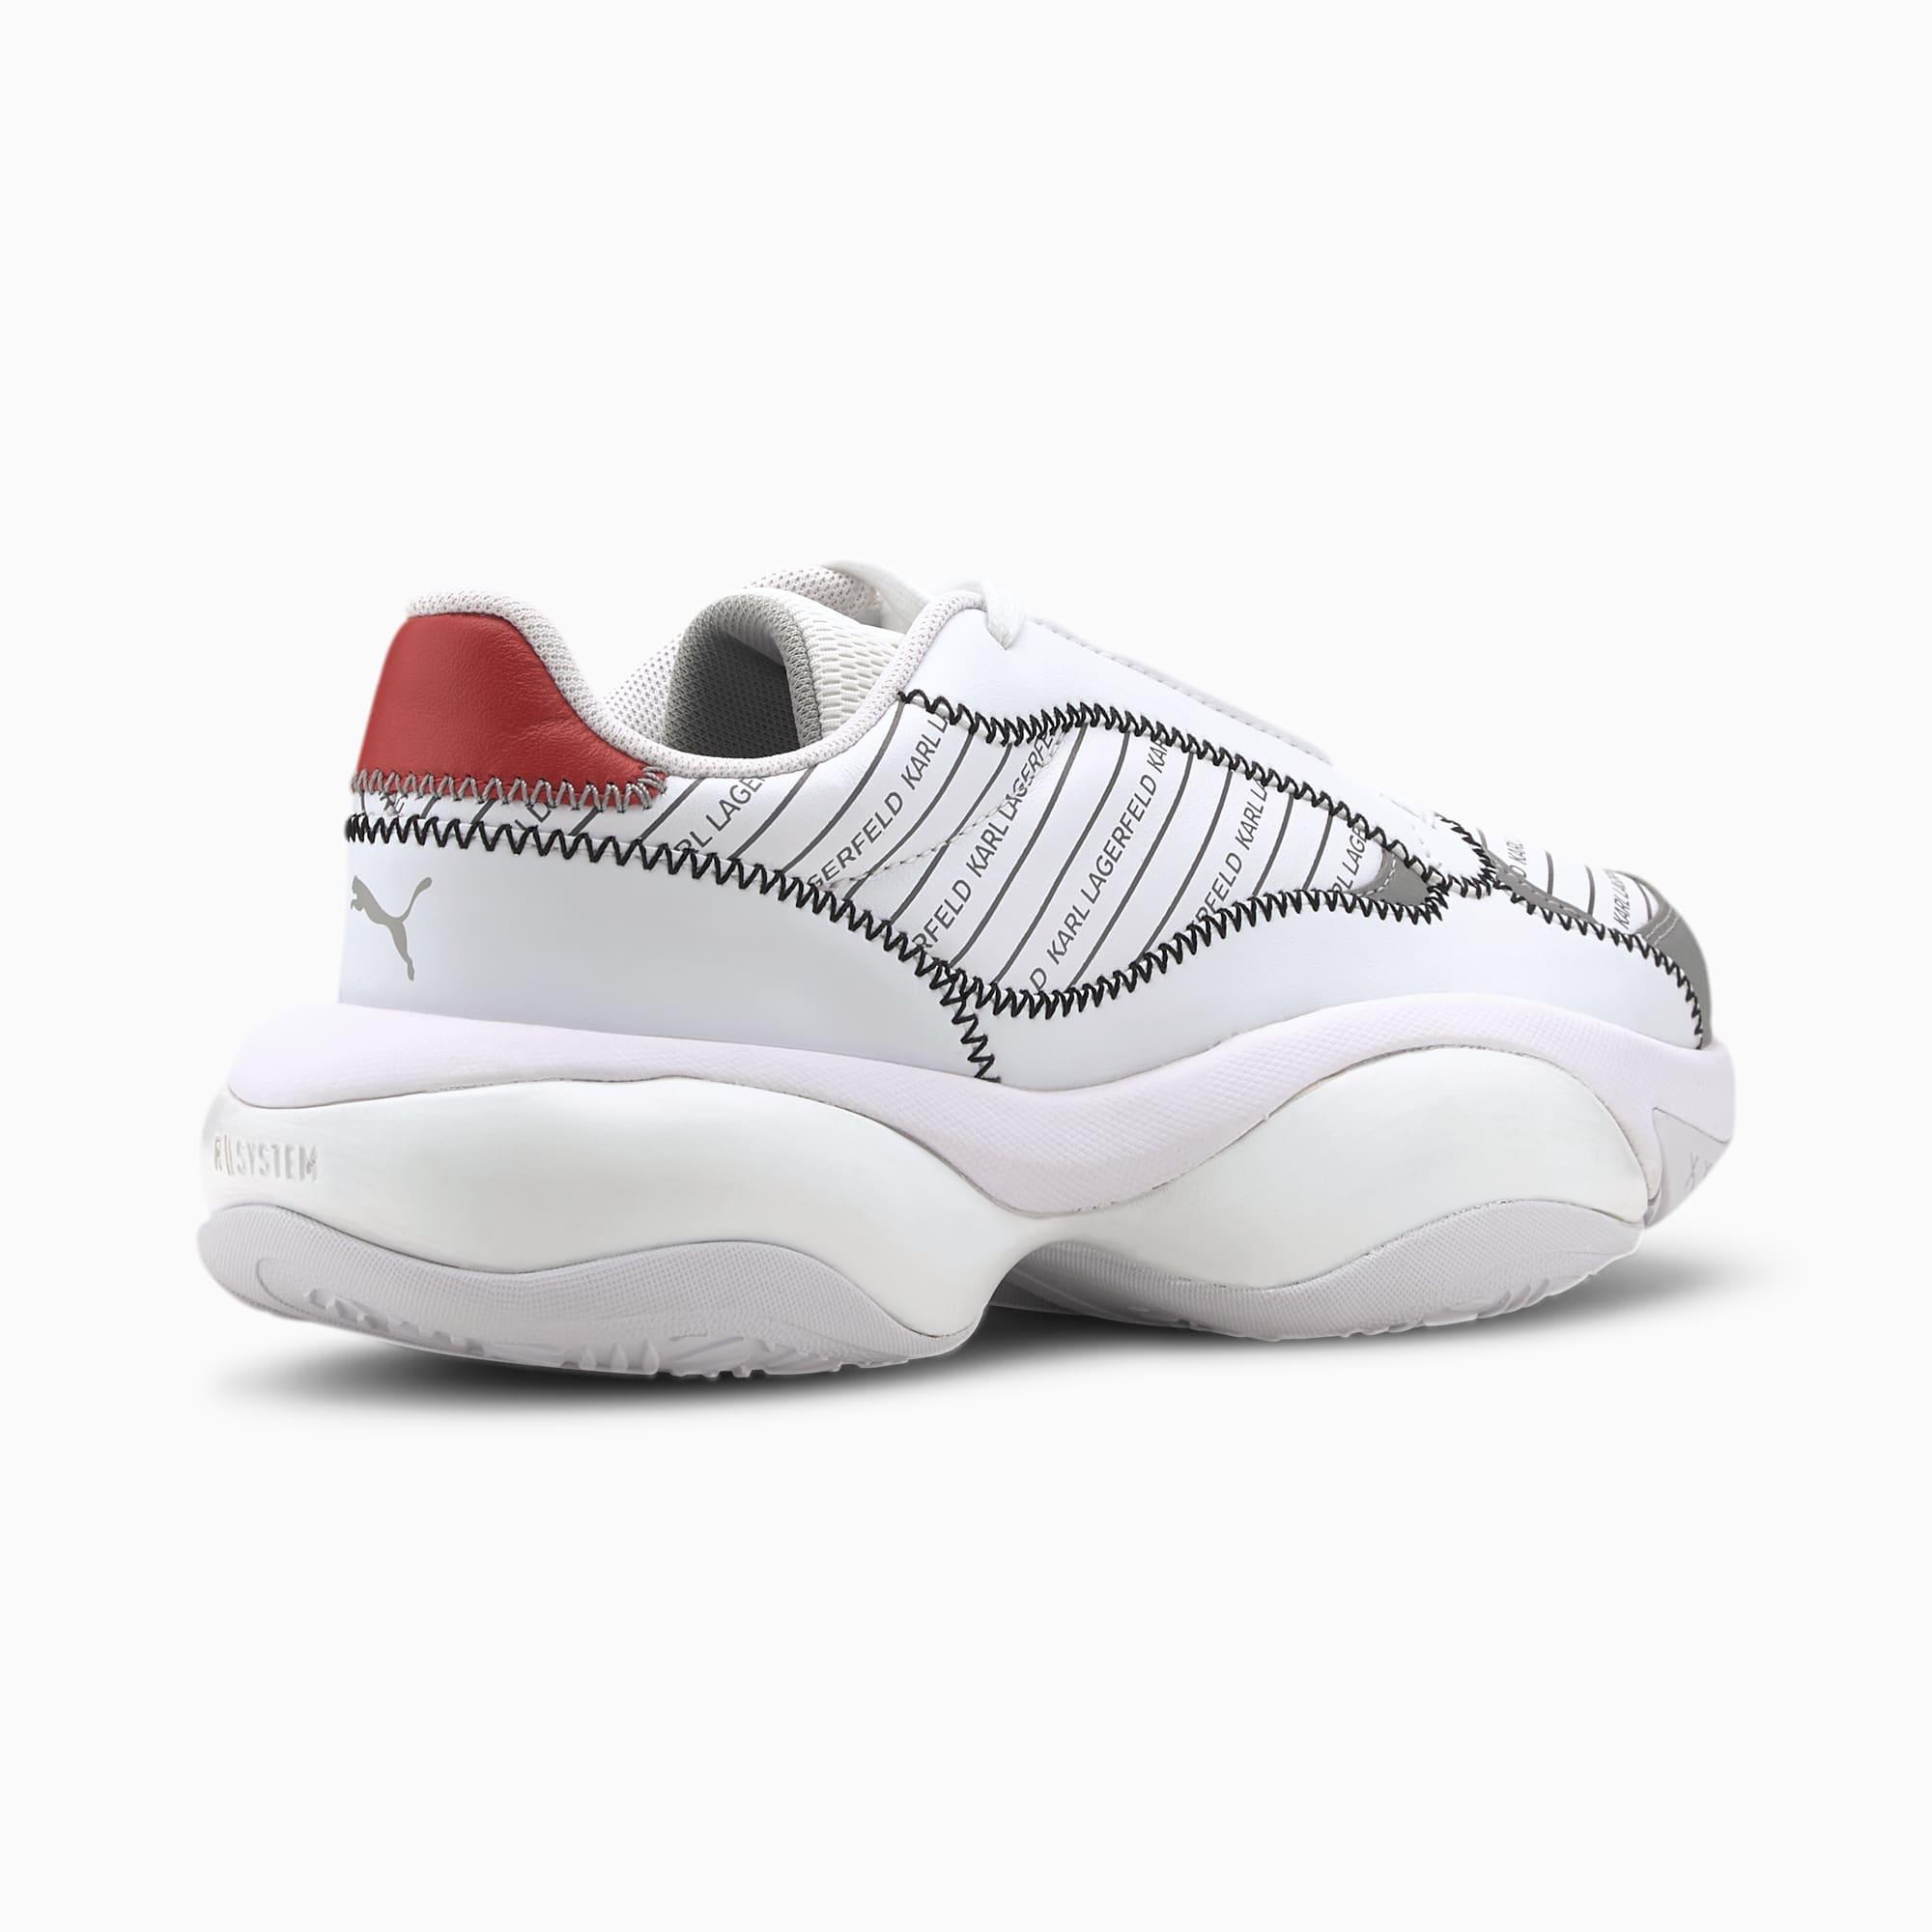 Karl Lagerfeld Scarpe da ginnastica, sandali, scarpe e